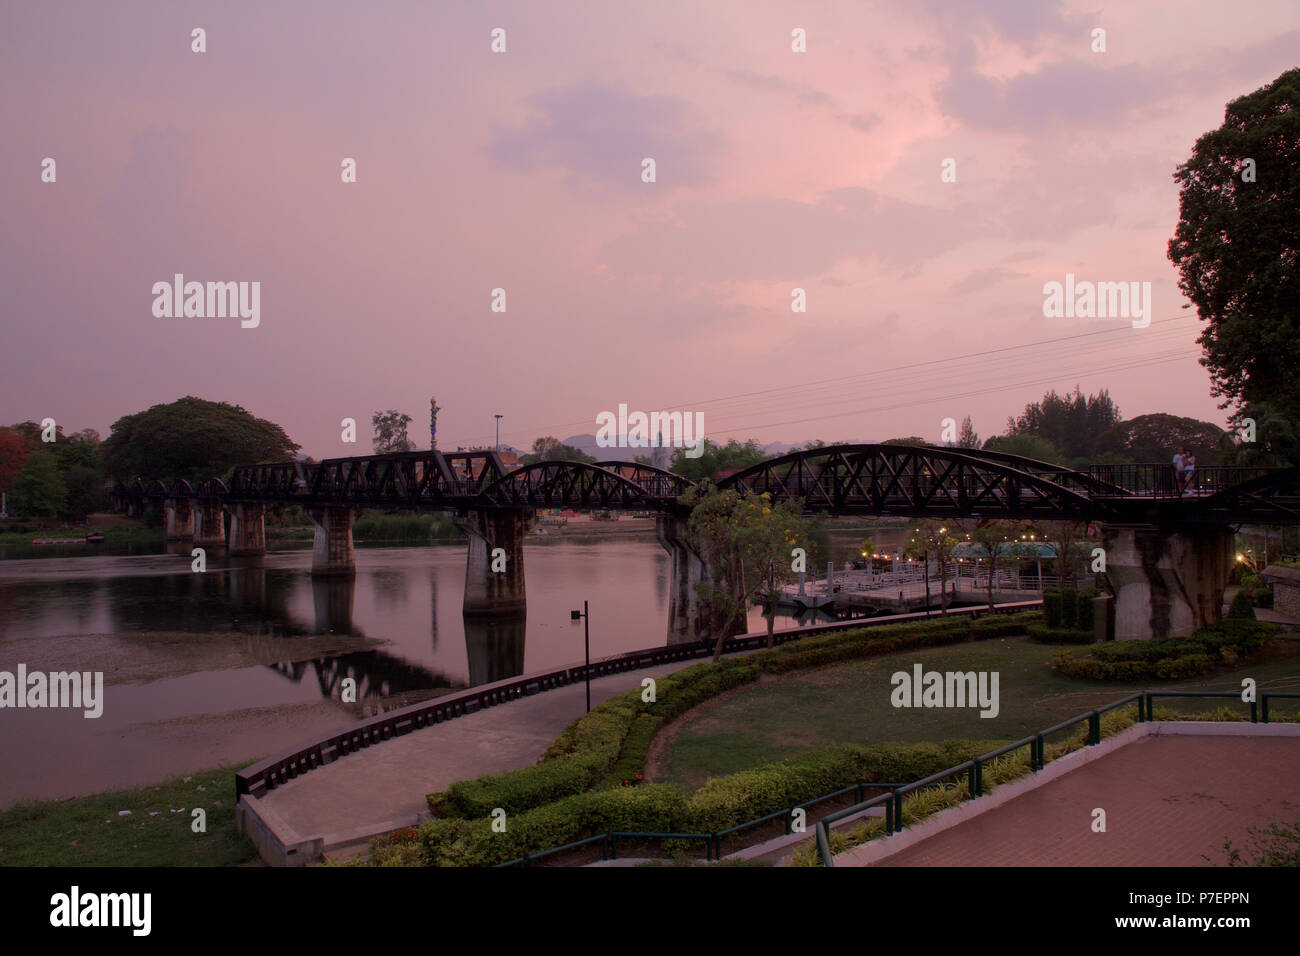 Kanchanaburi, Thailand - April 9, 2016: Tourists on the Bridge over The River Kwai after sunset - Stock Image